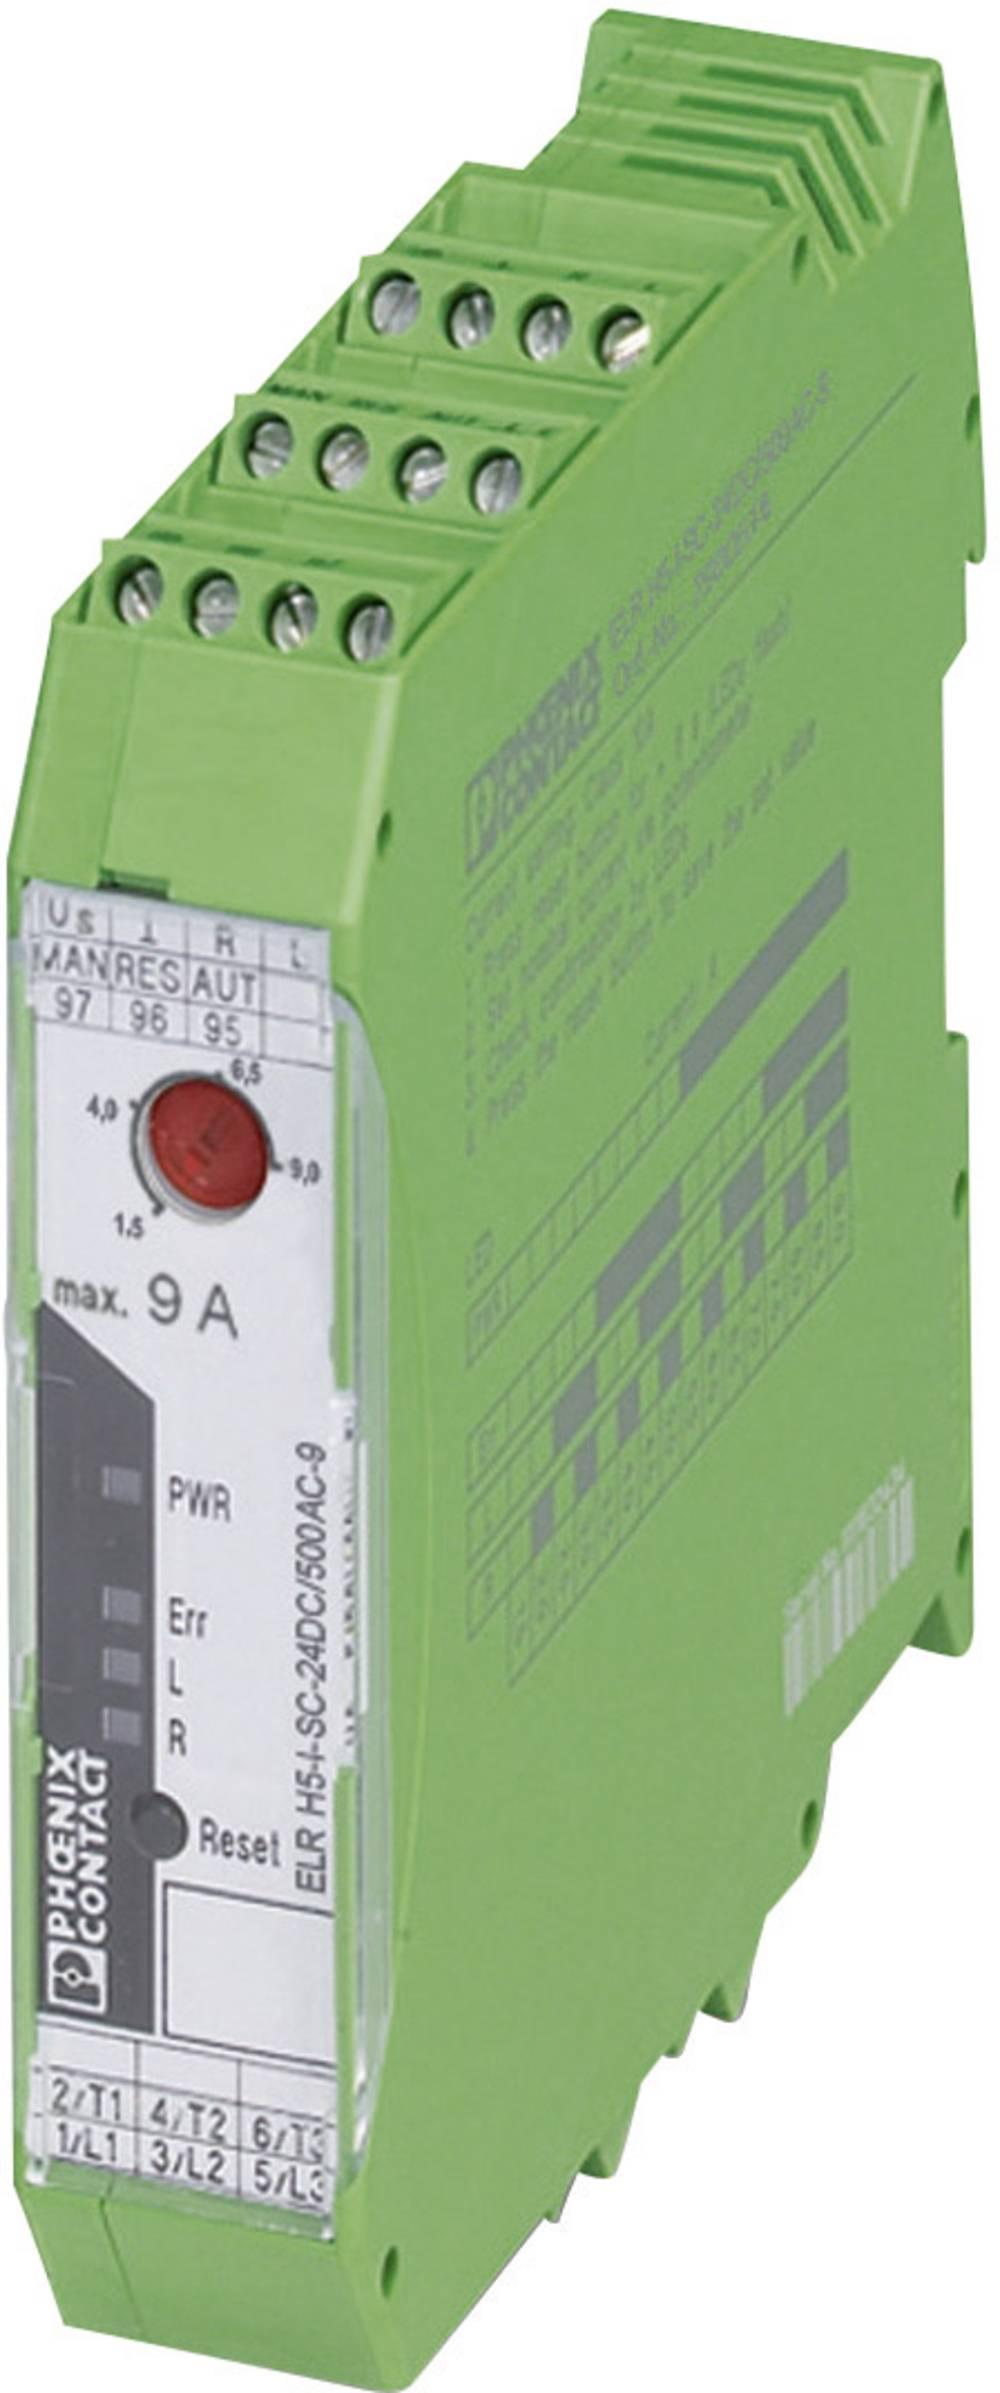 Motorbeskyttelse 1 stk ELR H5-I-SC-230AC/500AC-2 Phoenix Contact 230 V/AC 2.4 A